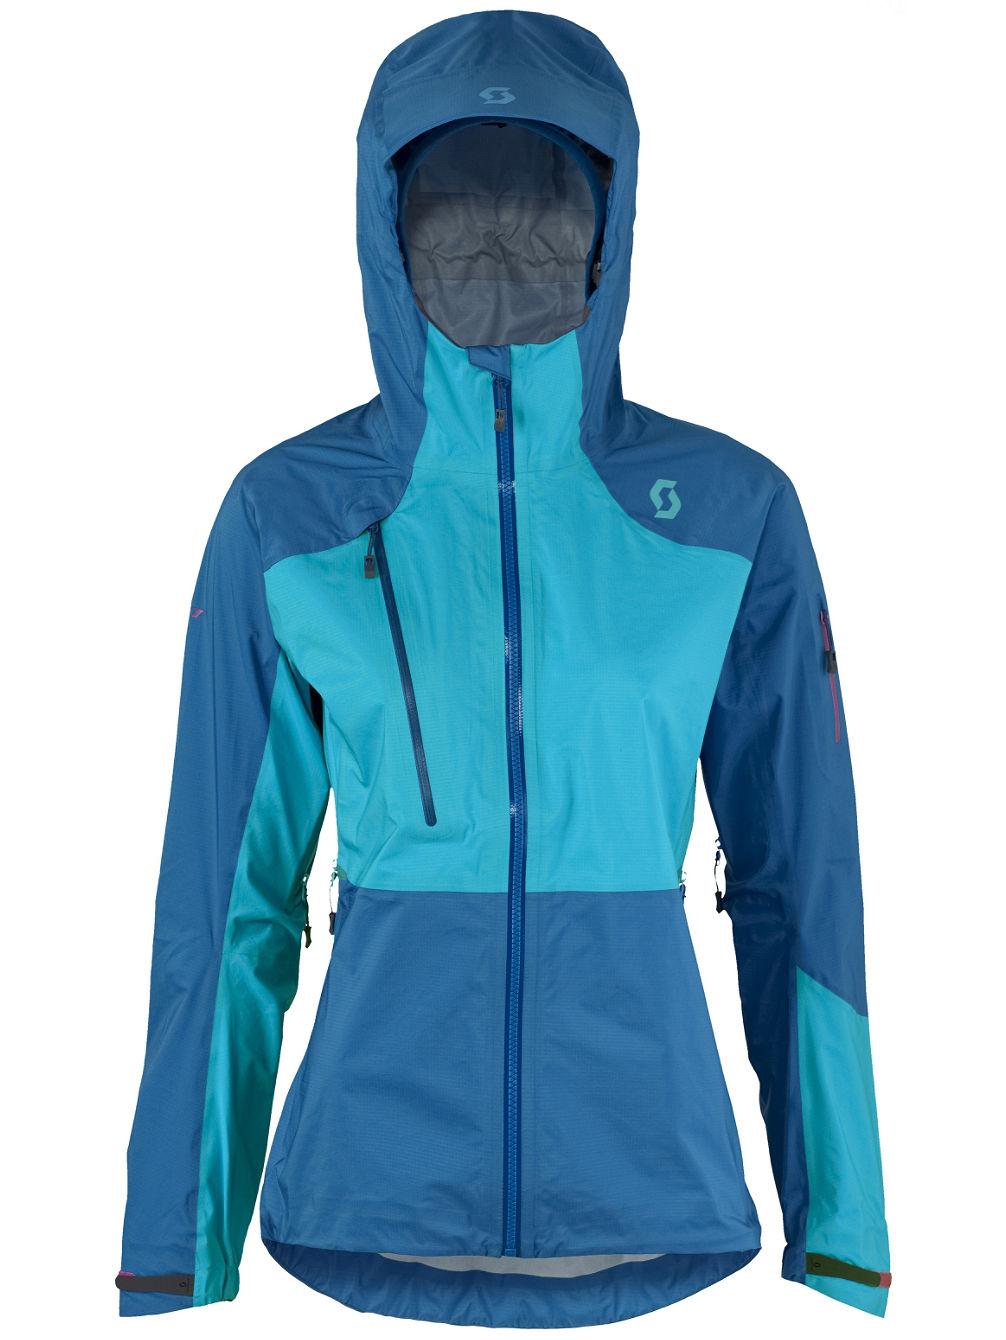 Scott Trail Mtn Dryo Plus Jacket - scott - blue-tomato.com